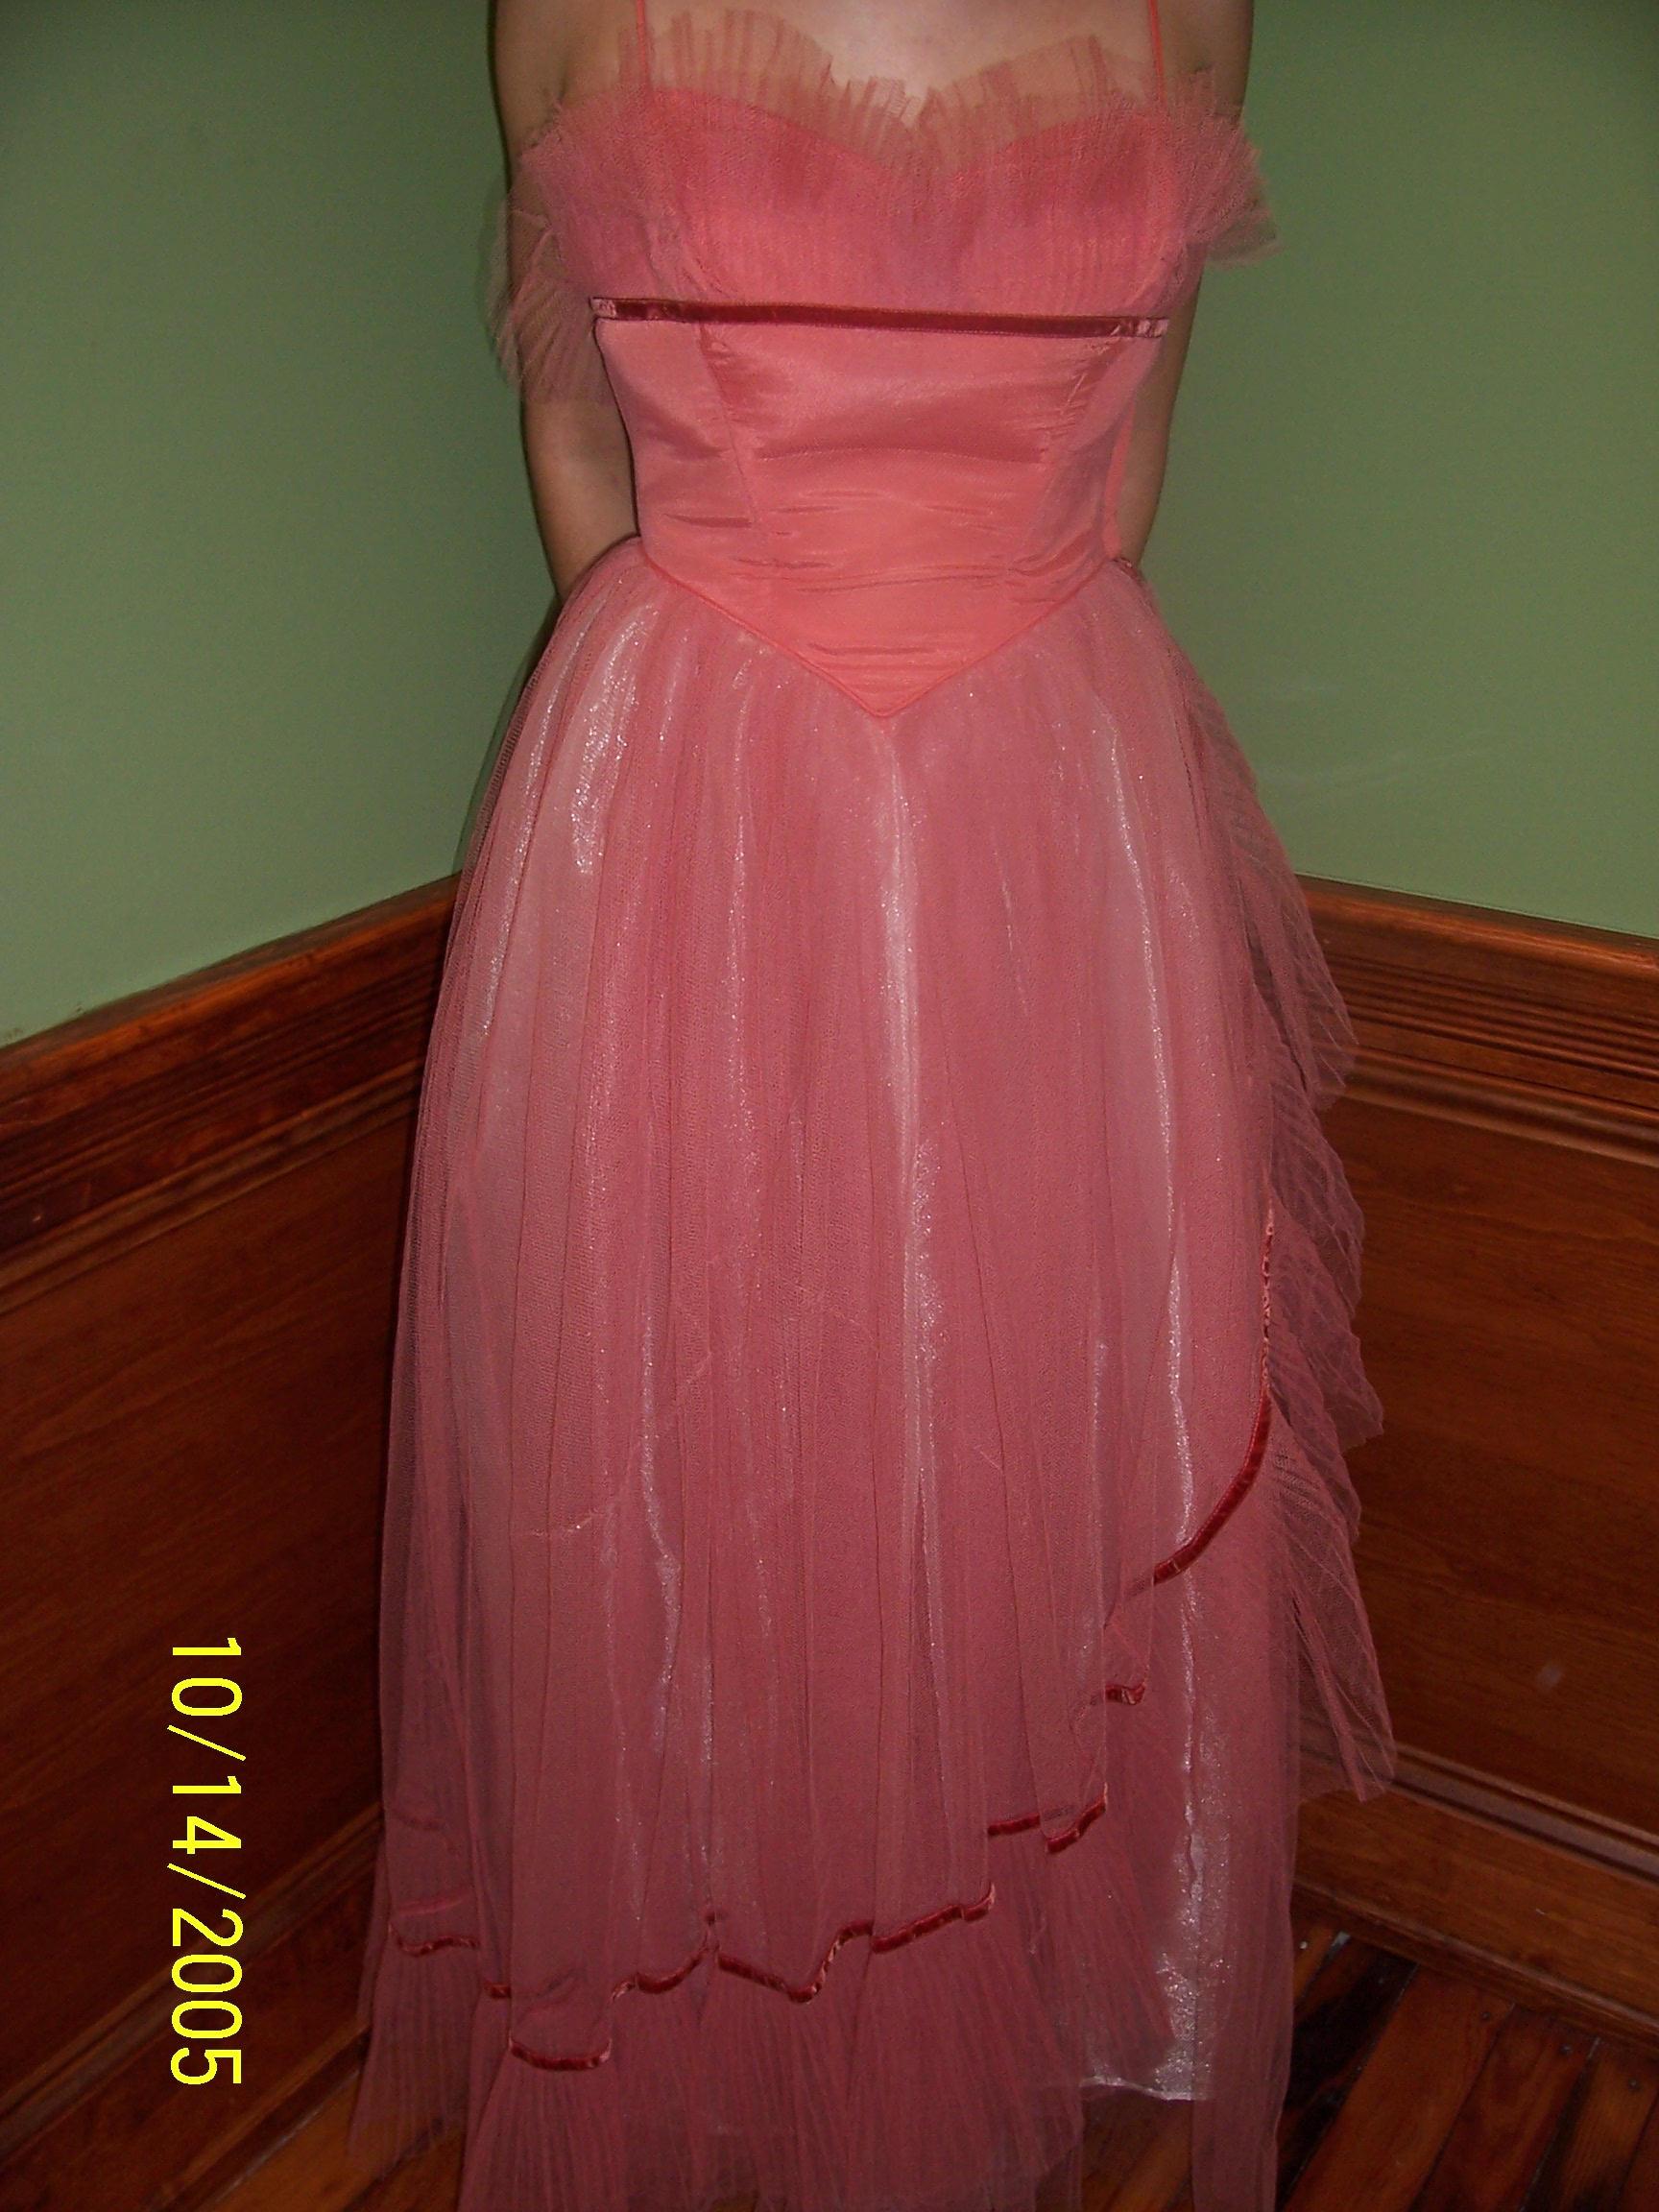 just my dress by MungoChelsQuaxo